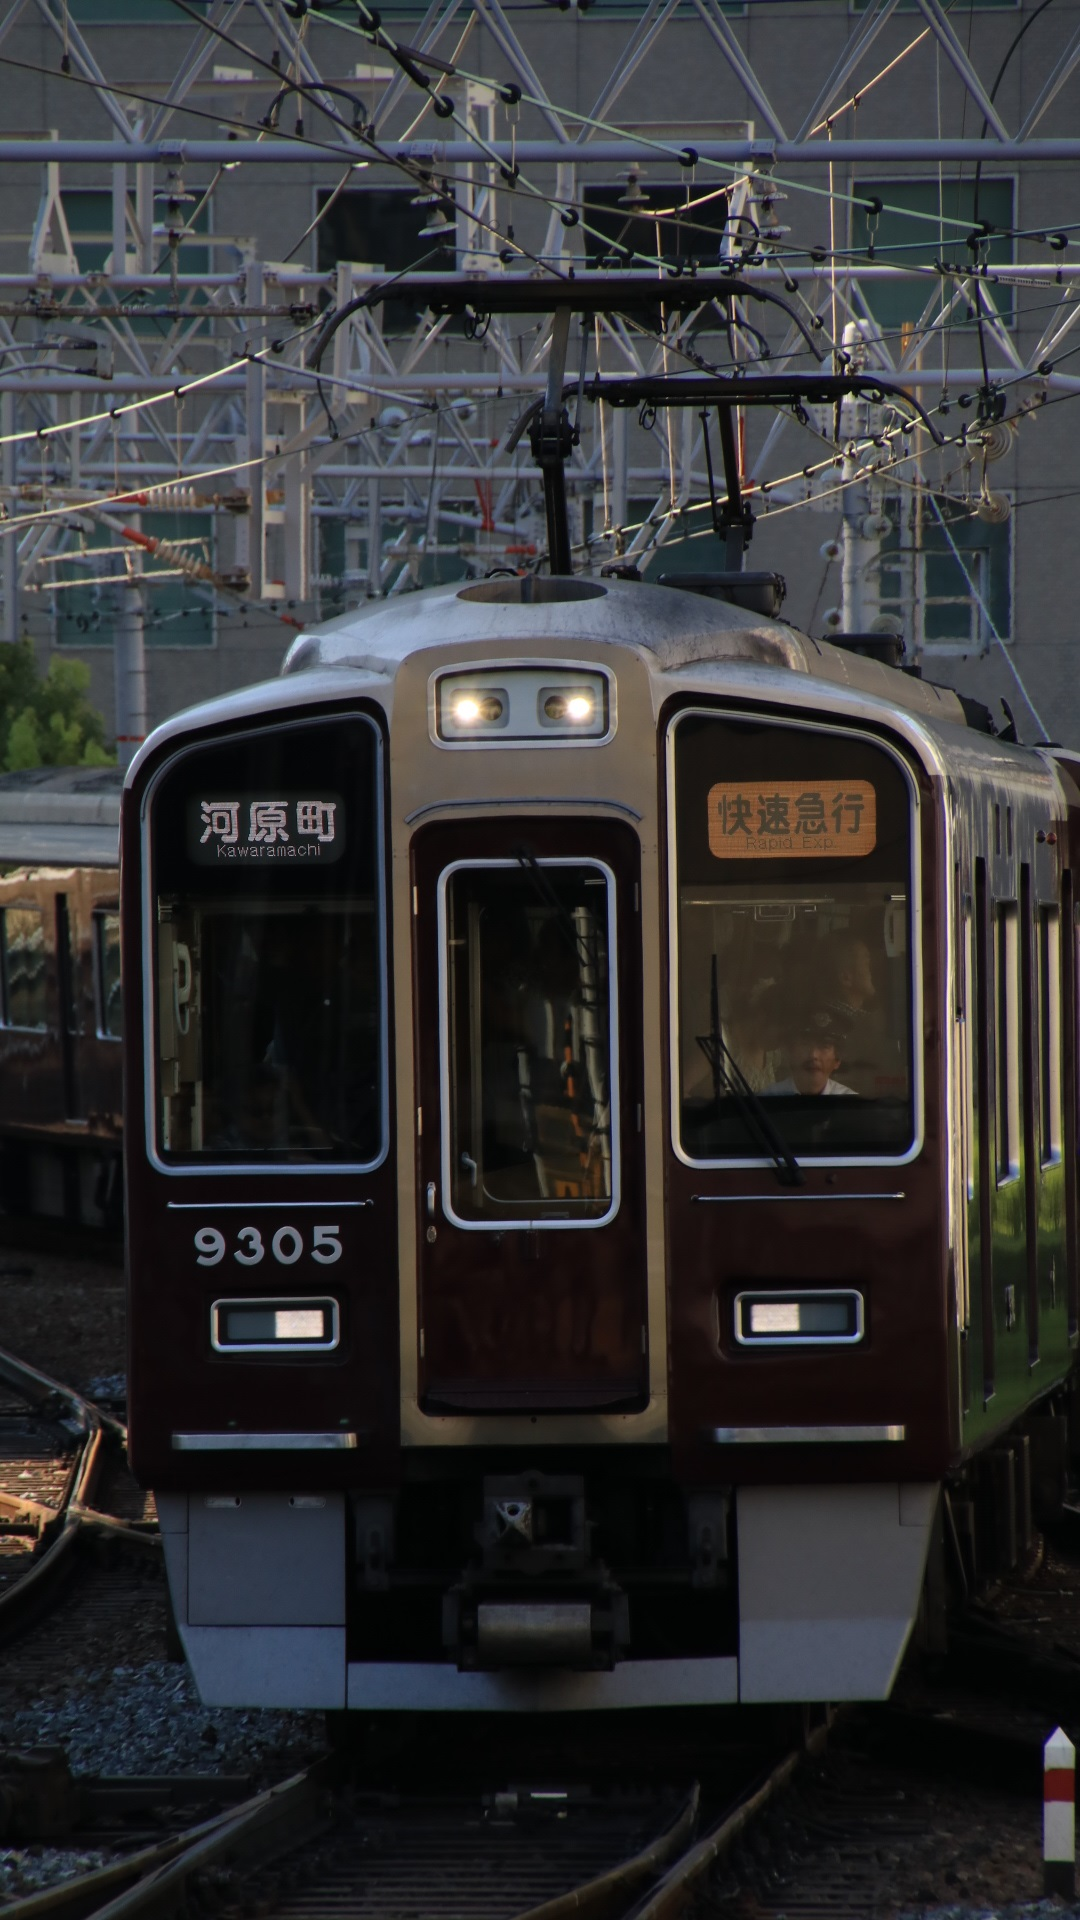 夕方の阪急京都線 _d0202264_21171195.jpg